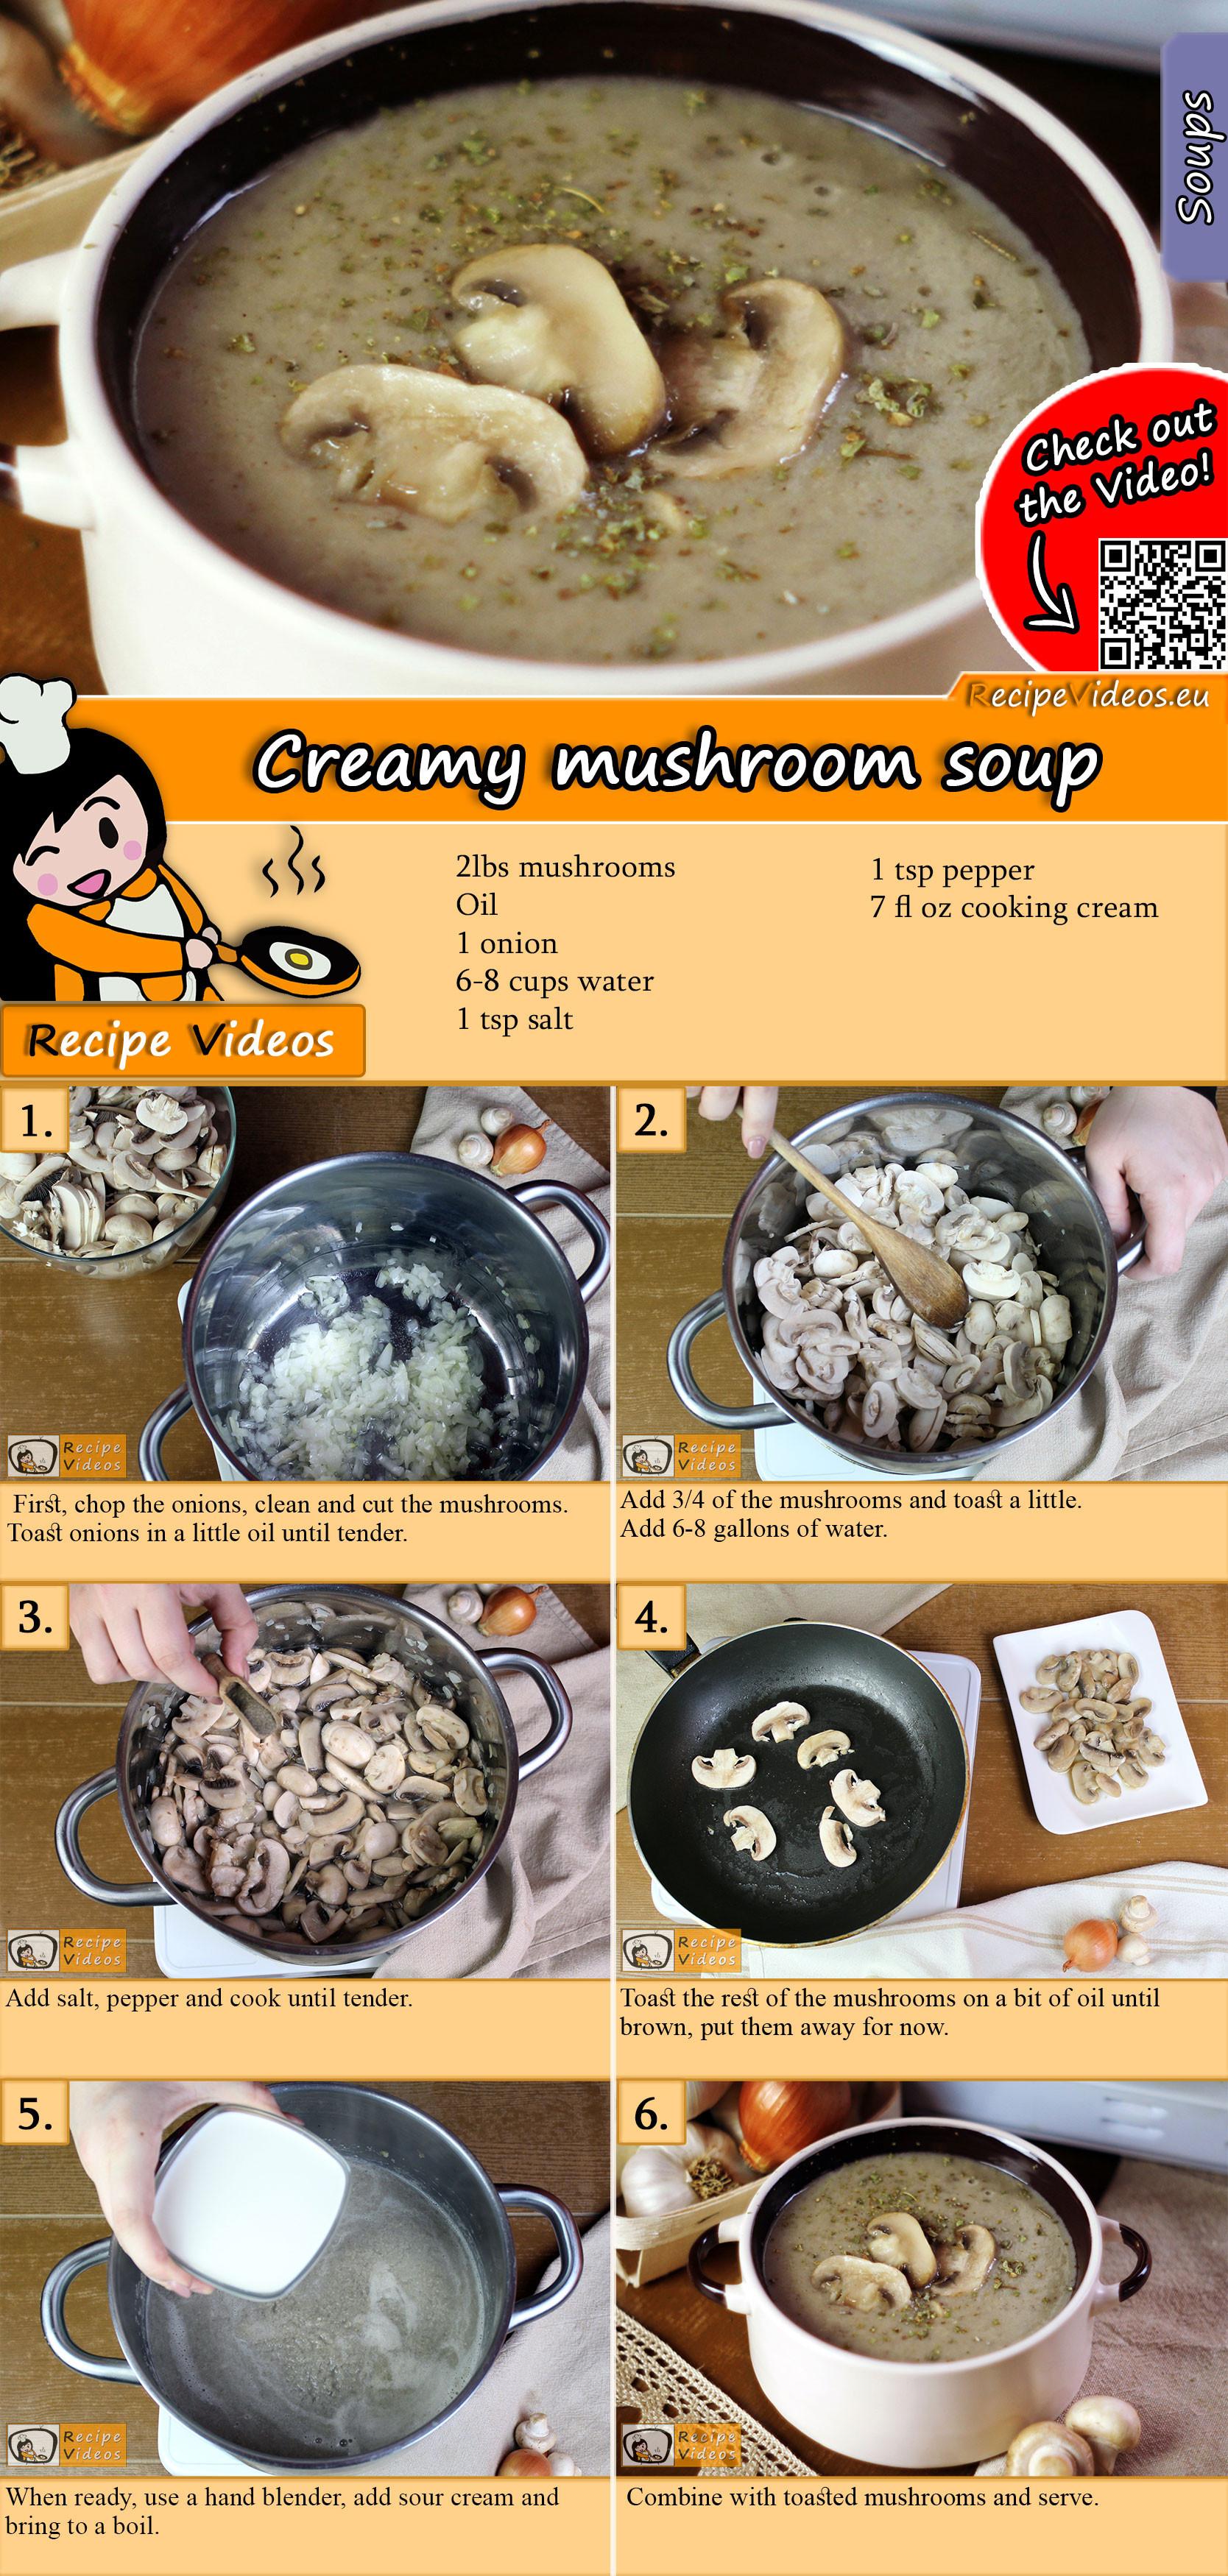 Creamy mushroom soup recipe with video